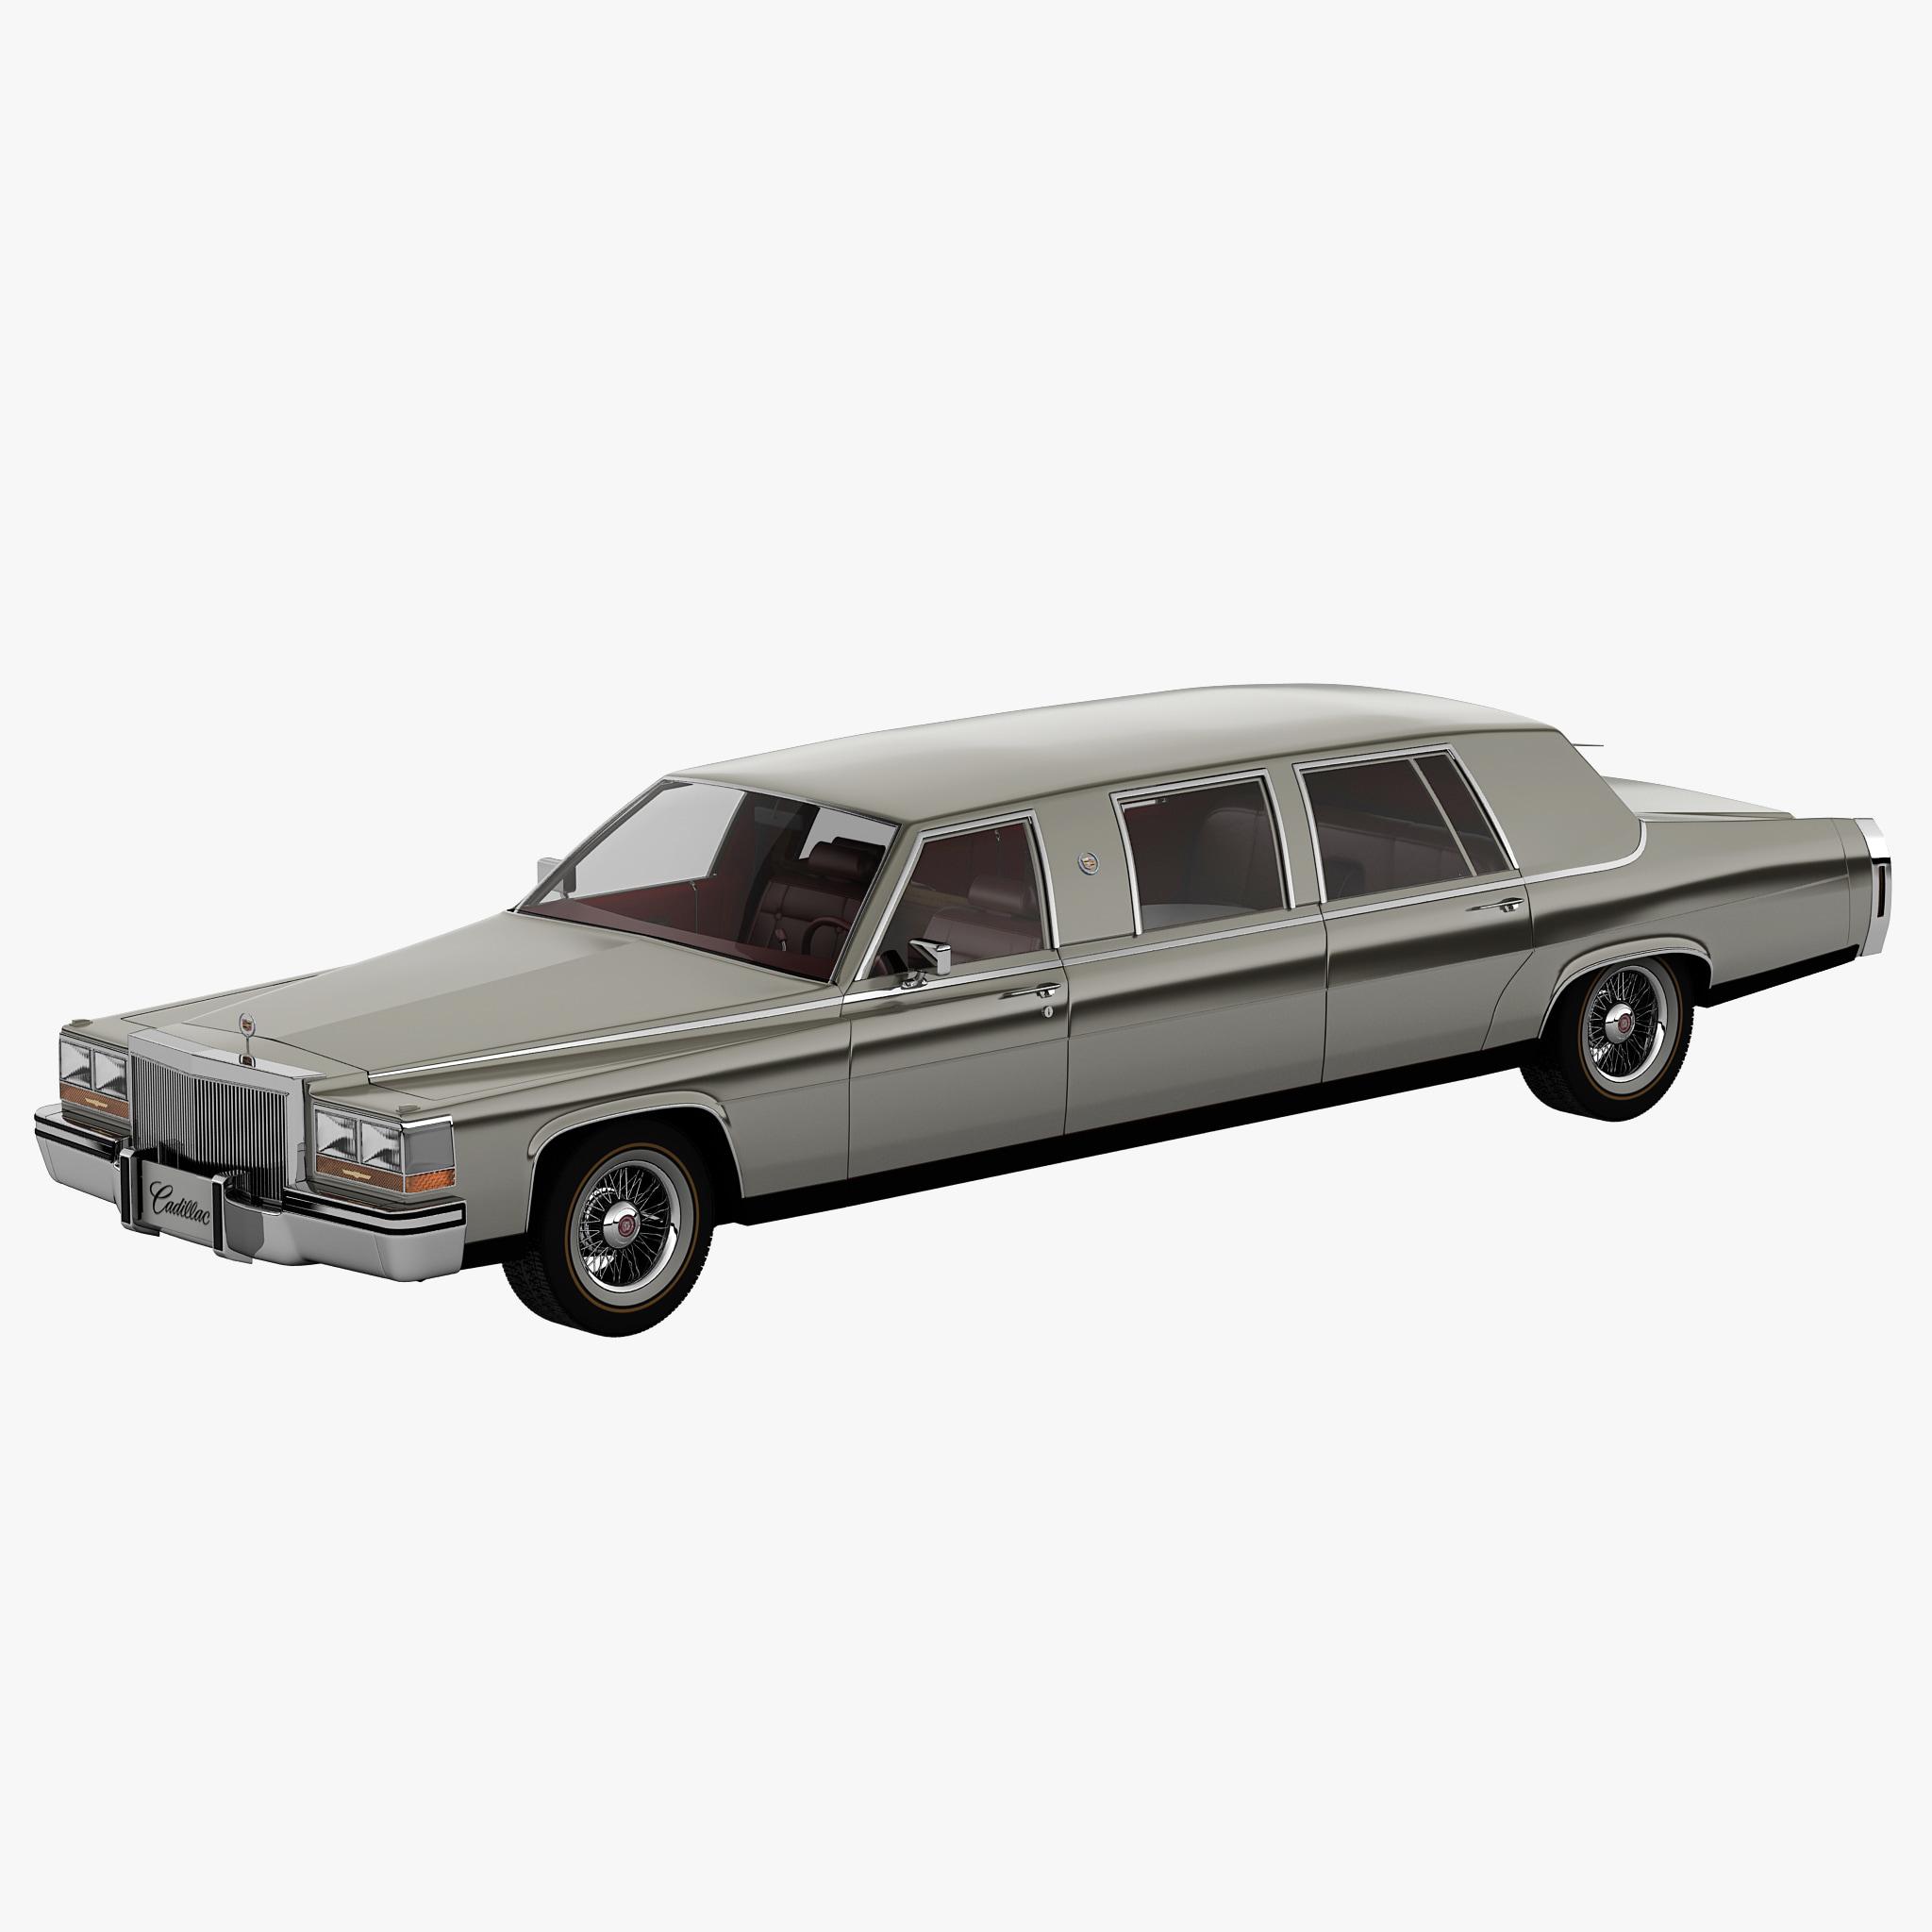 Cadillac Fleetwood limousine 1986_1.jpg